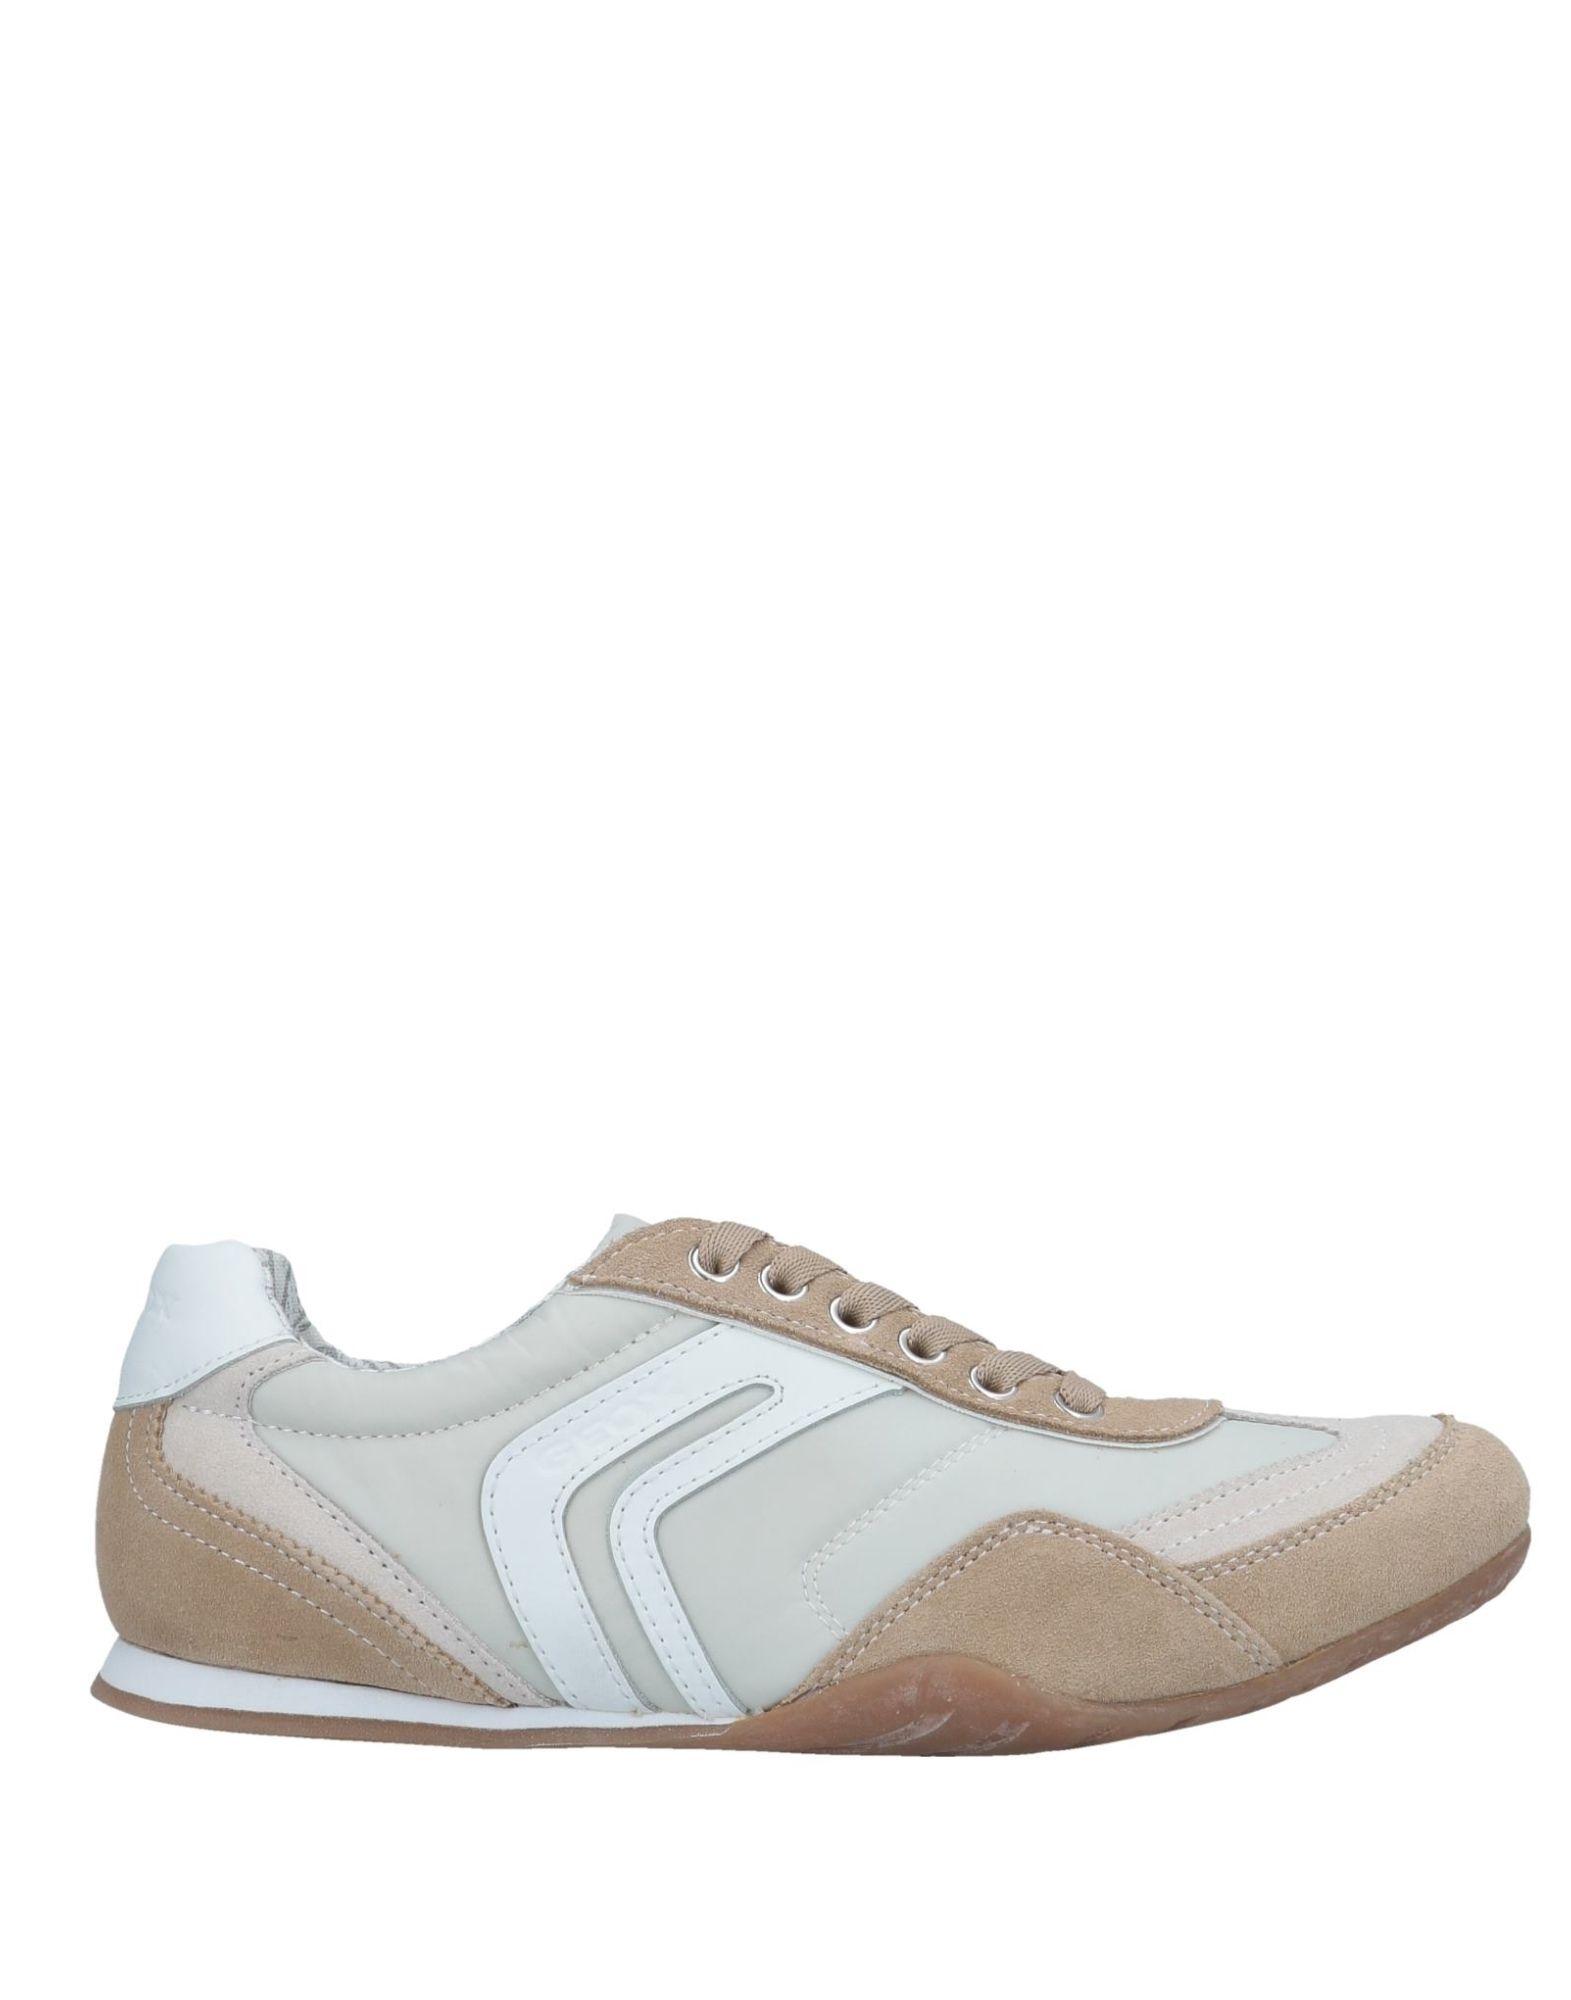 Geox Sneakers - Women Geox Sneakers online on 11552993MX  United Kingdom - 11552993MX on 0fb3ab